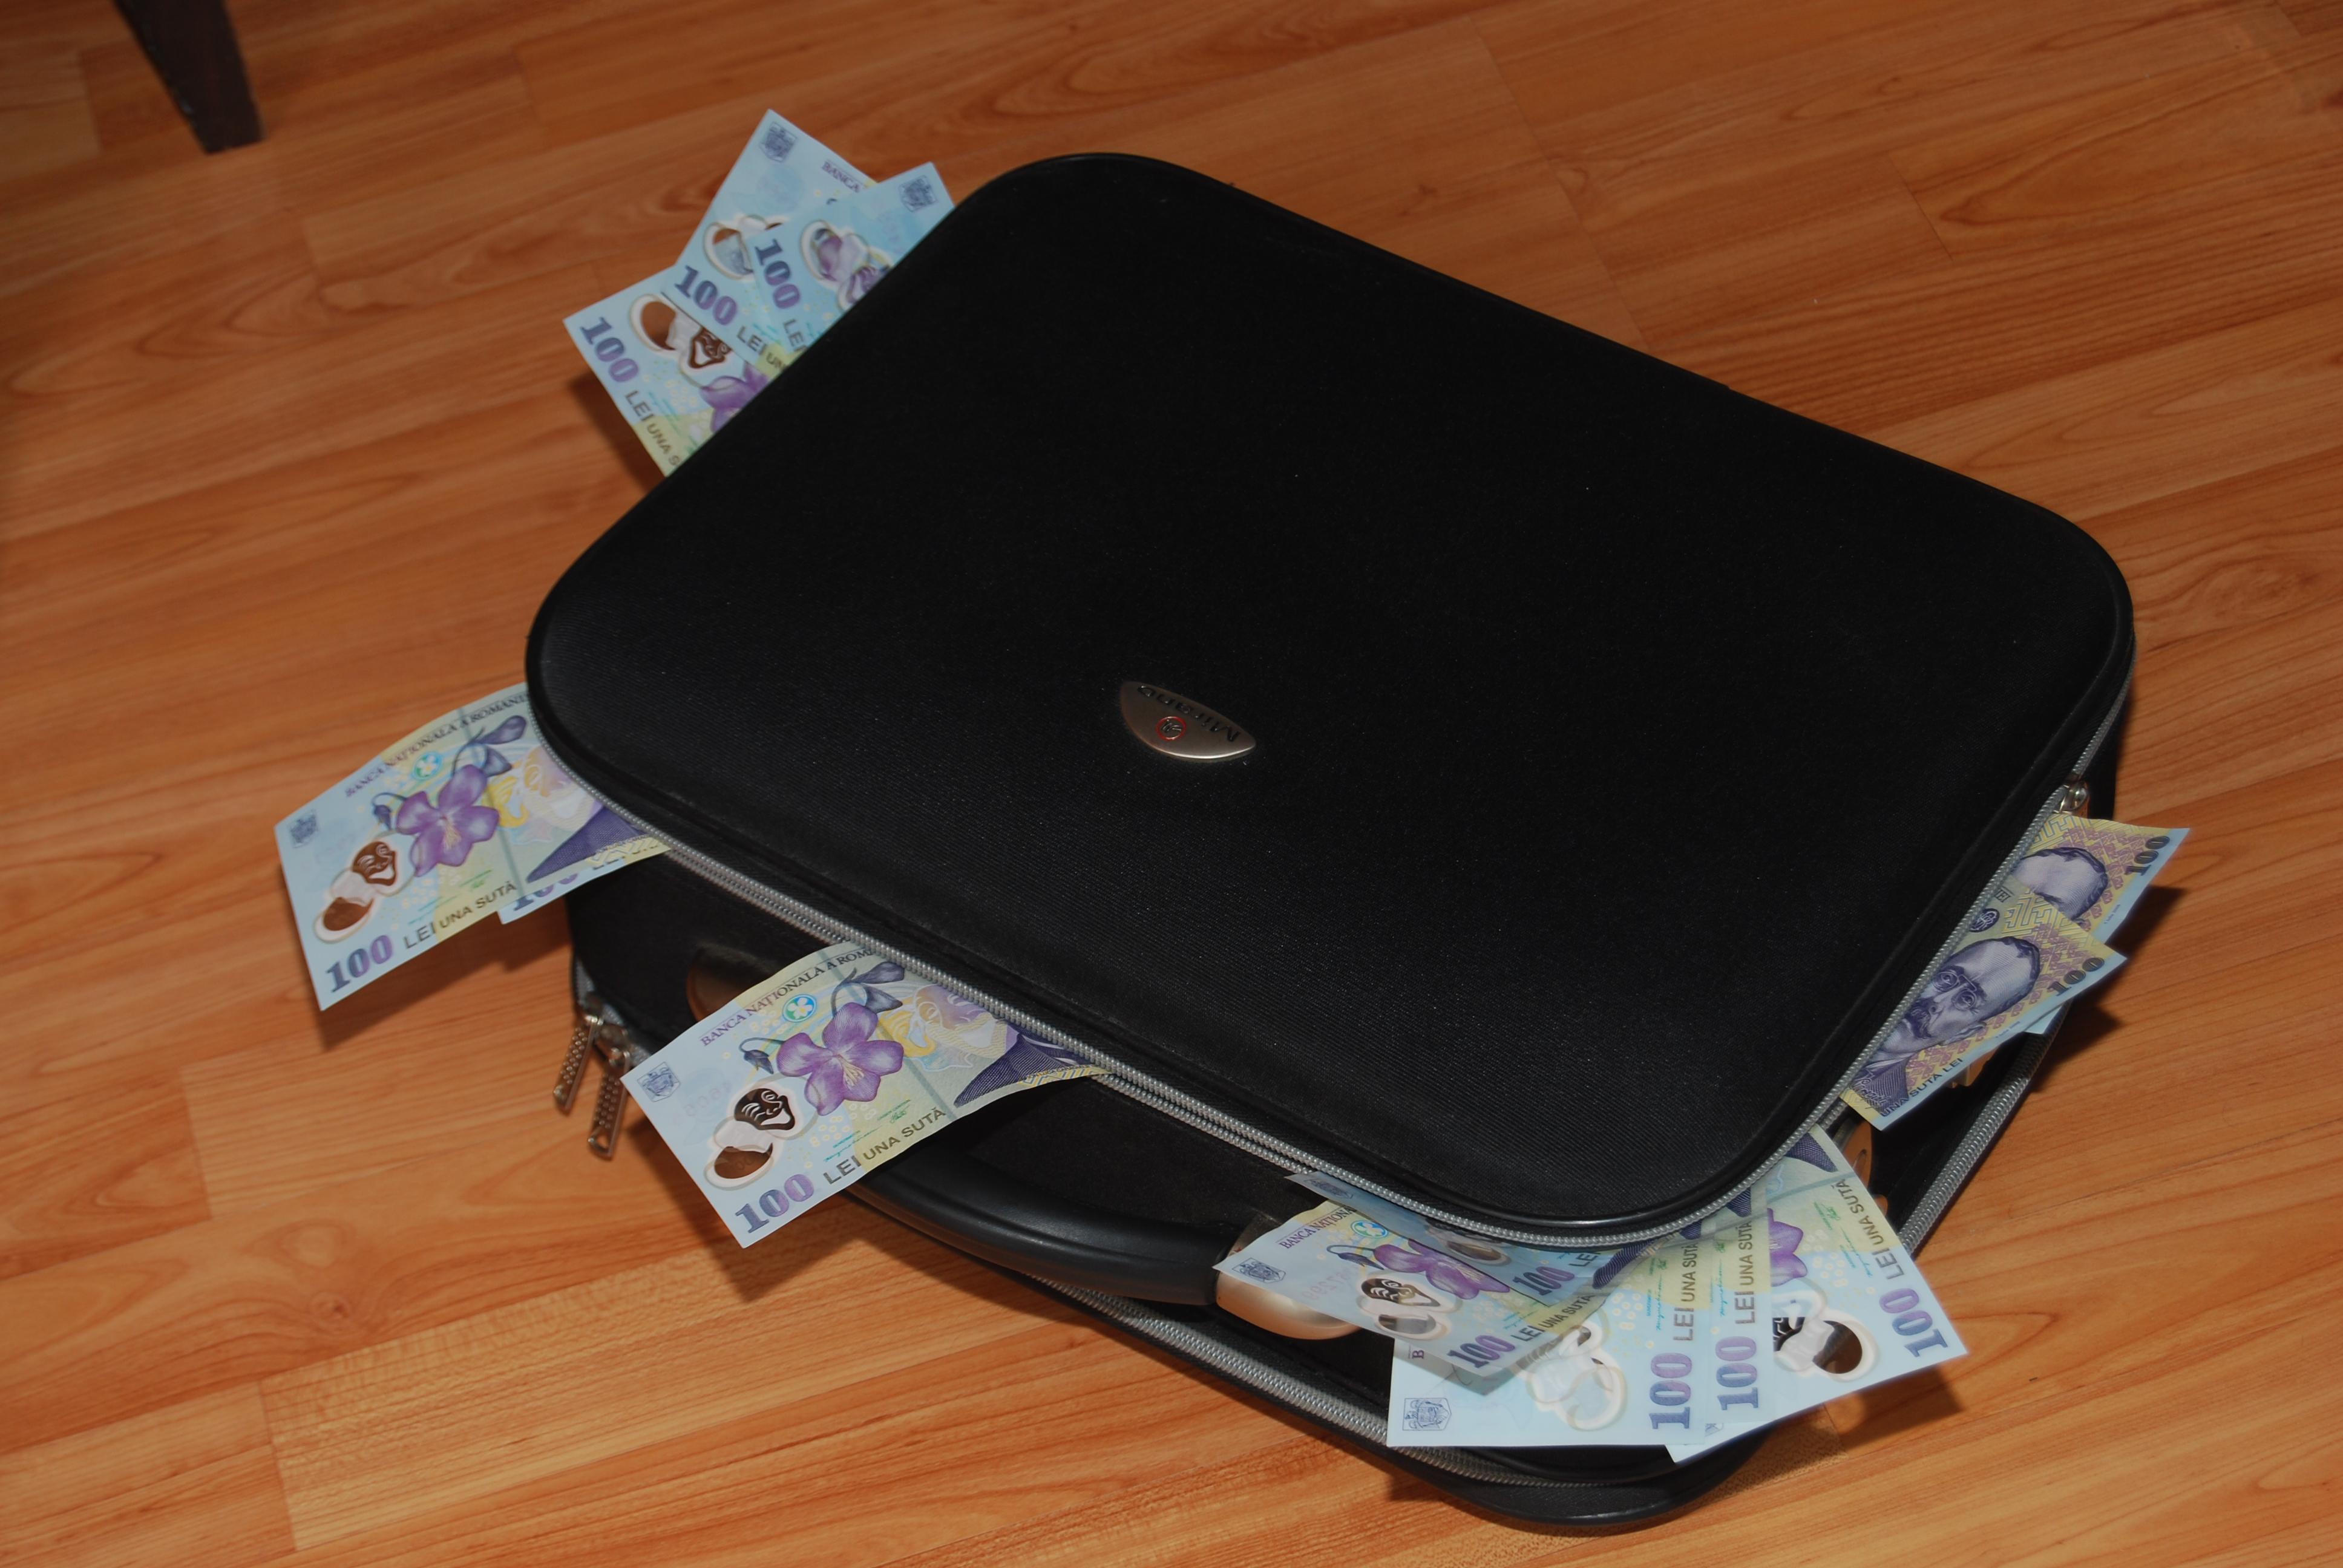 Geanta cu bani, uitata intr-un magazin din Timisoara, returnata